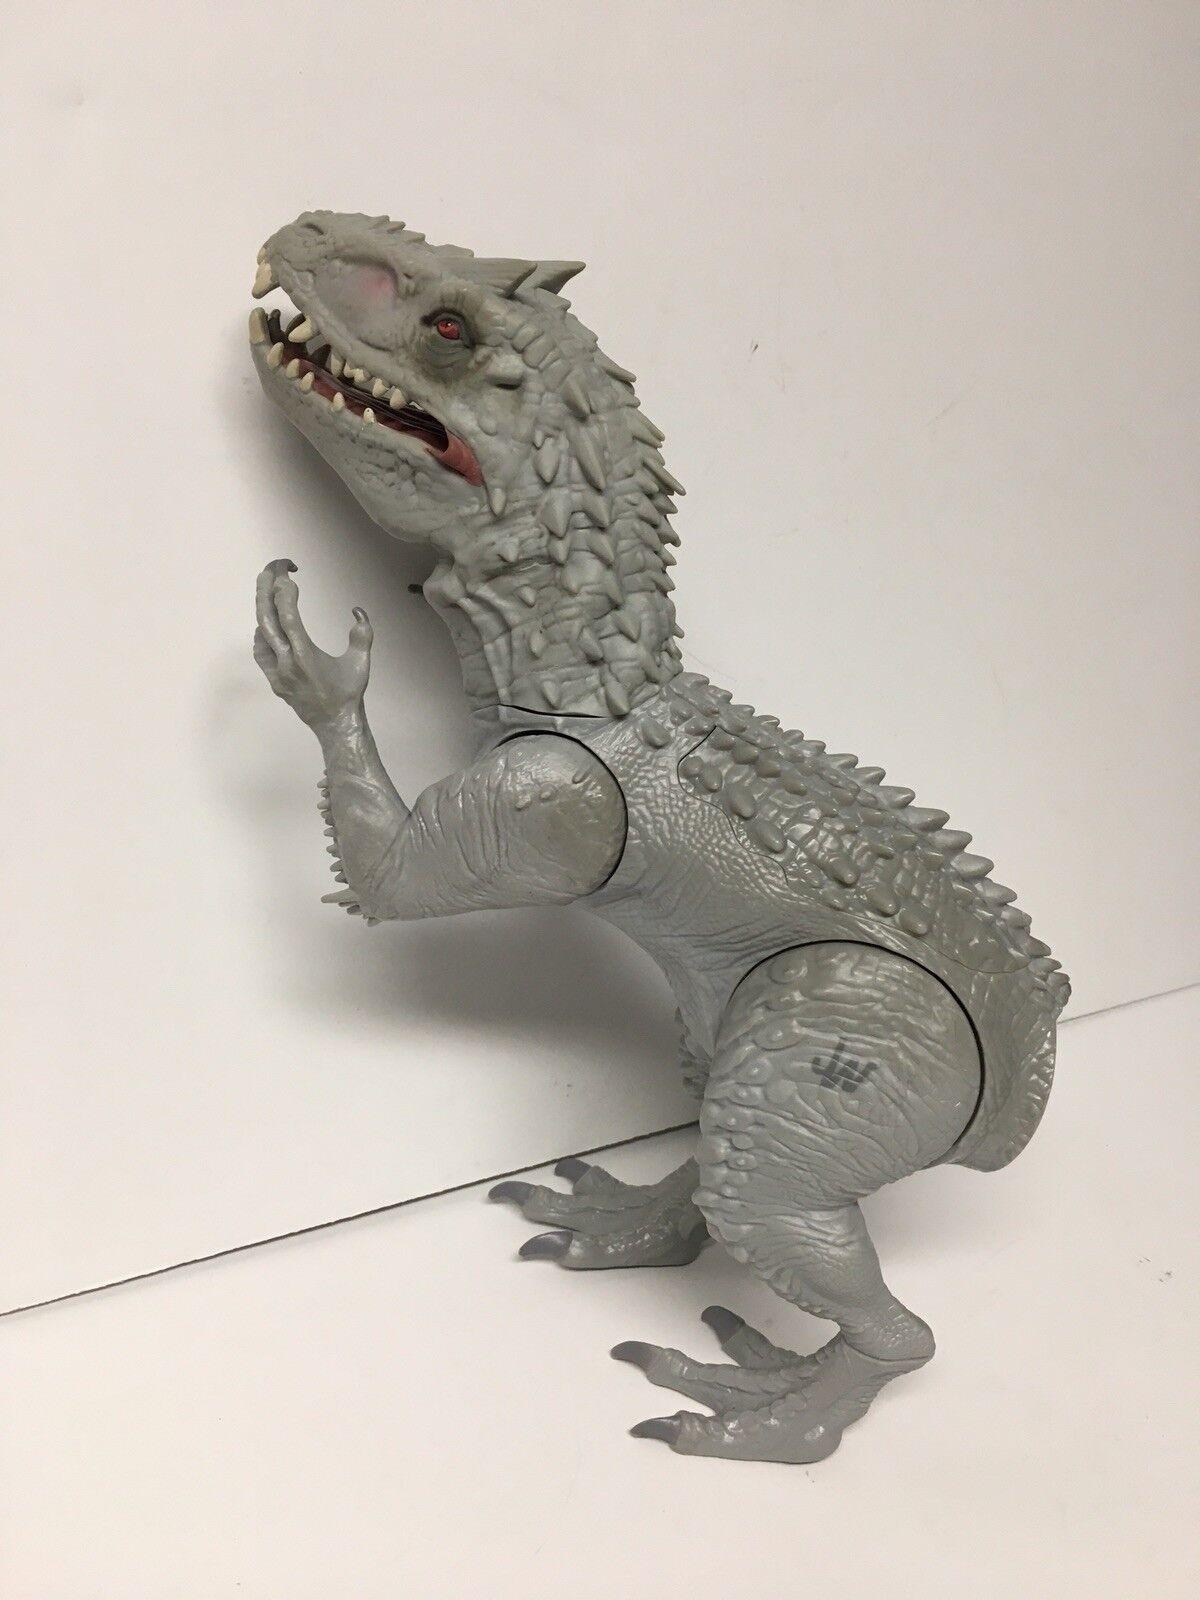 Jurassic World Indominus Rex Rex Rex Dinosaur With Lights and Sound Missing Tail 80ec4a